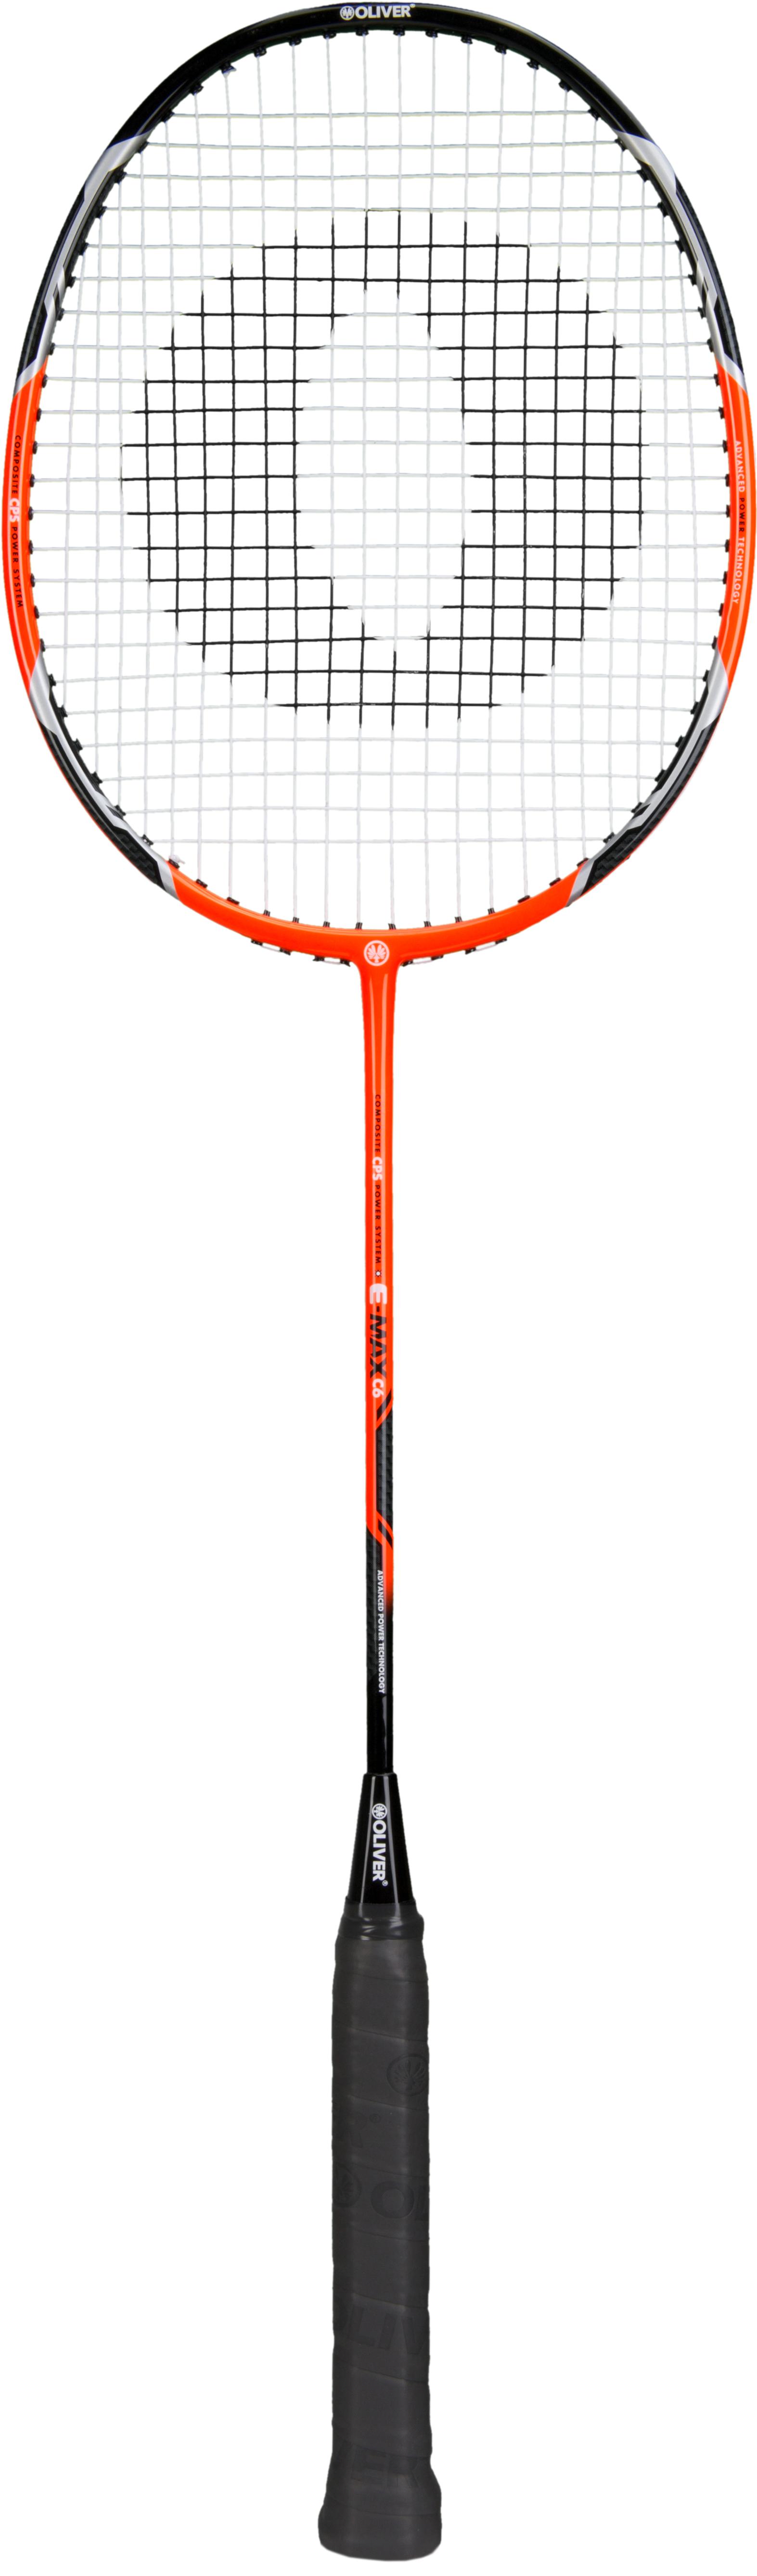 Image of   Oliver E-MAX C6 Badminton Racket - Orange / Black